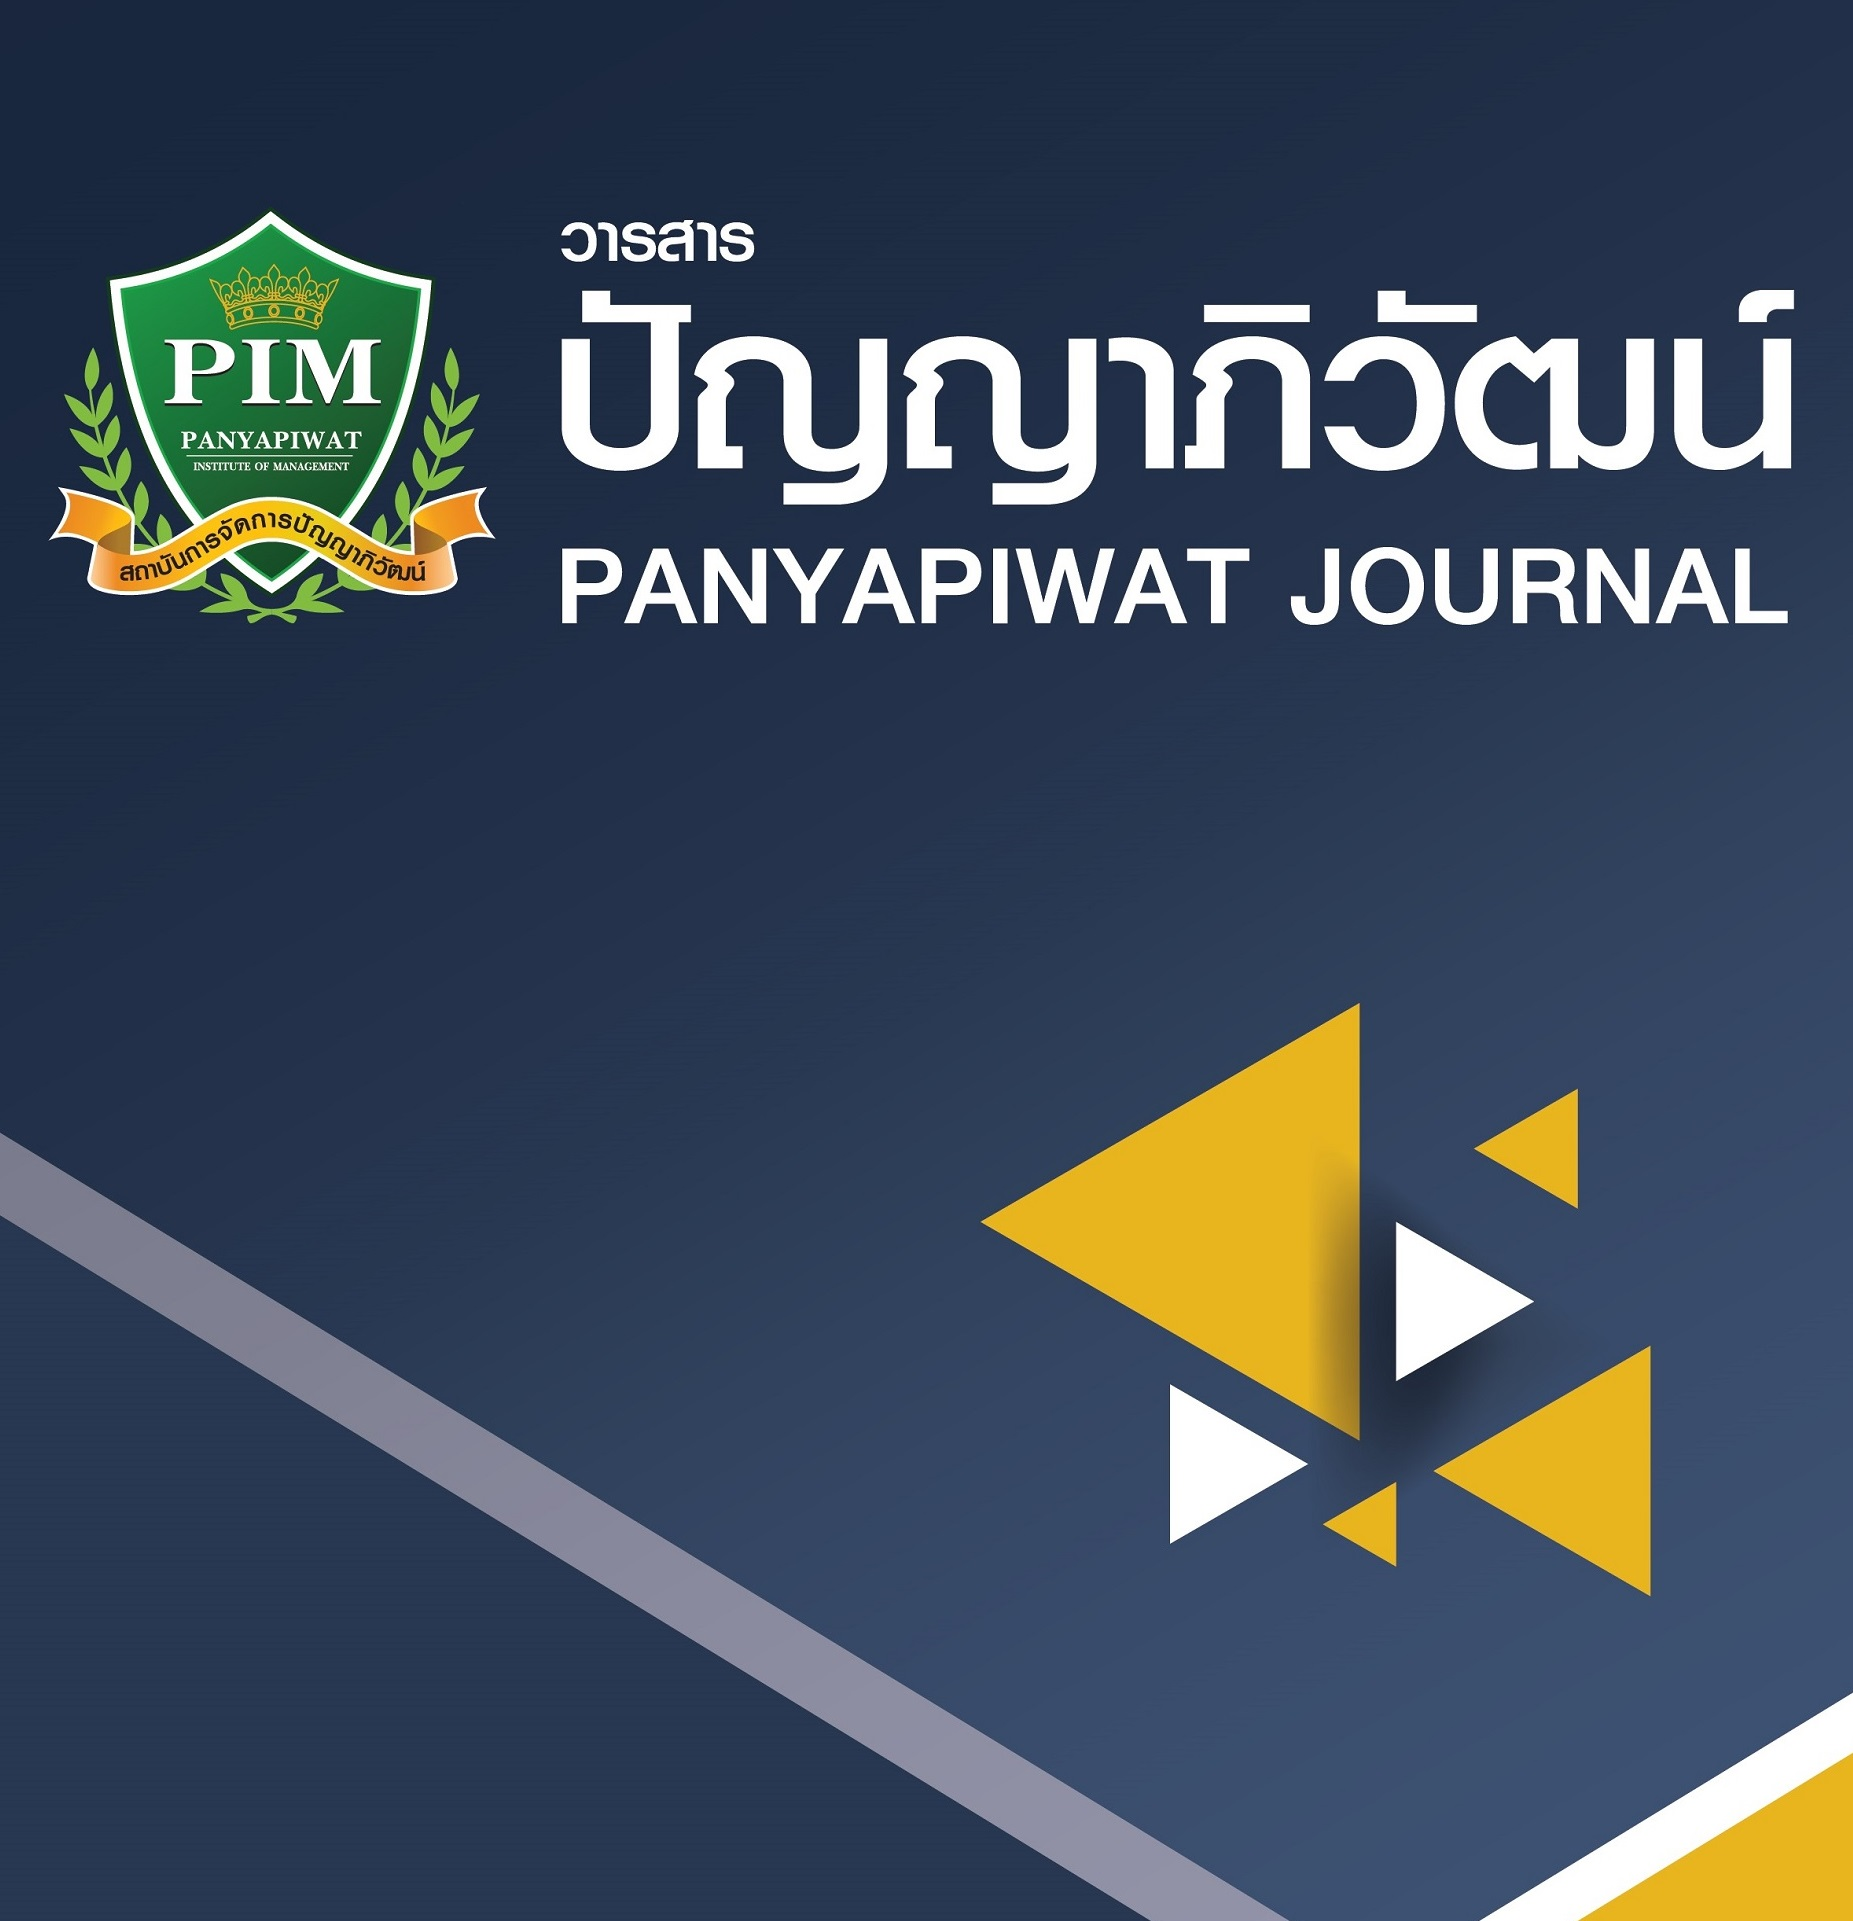 pim2018